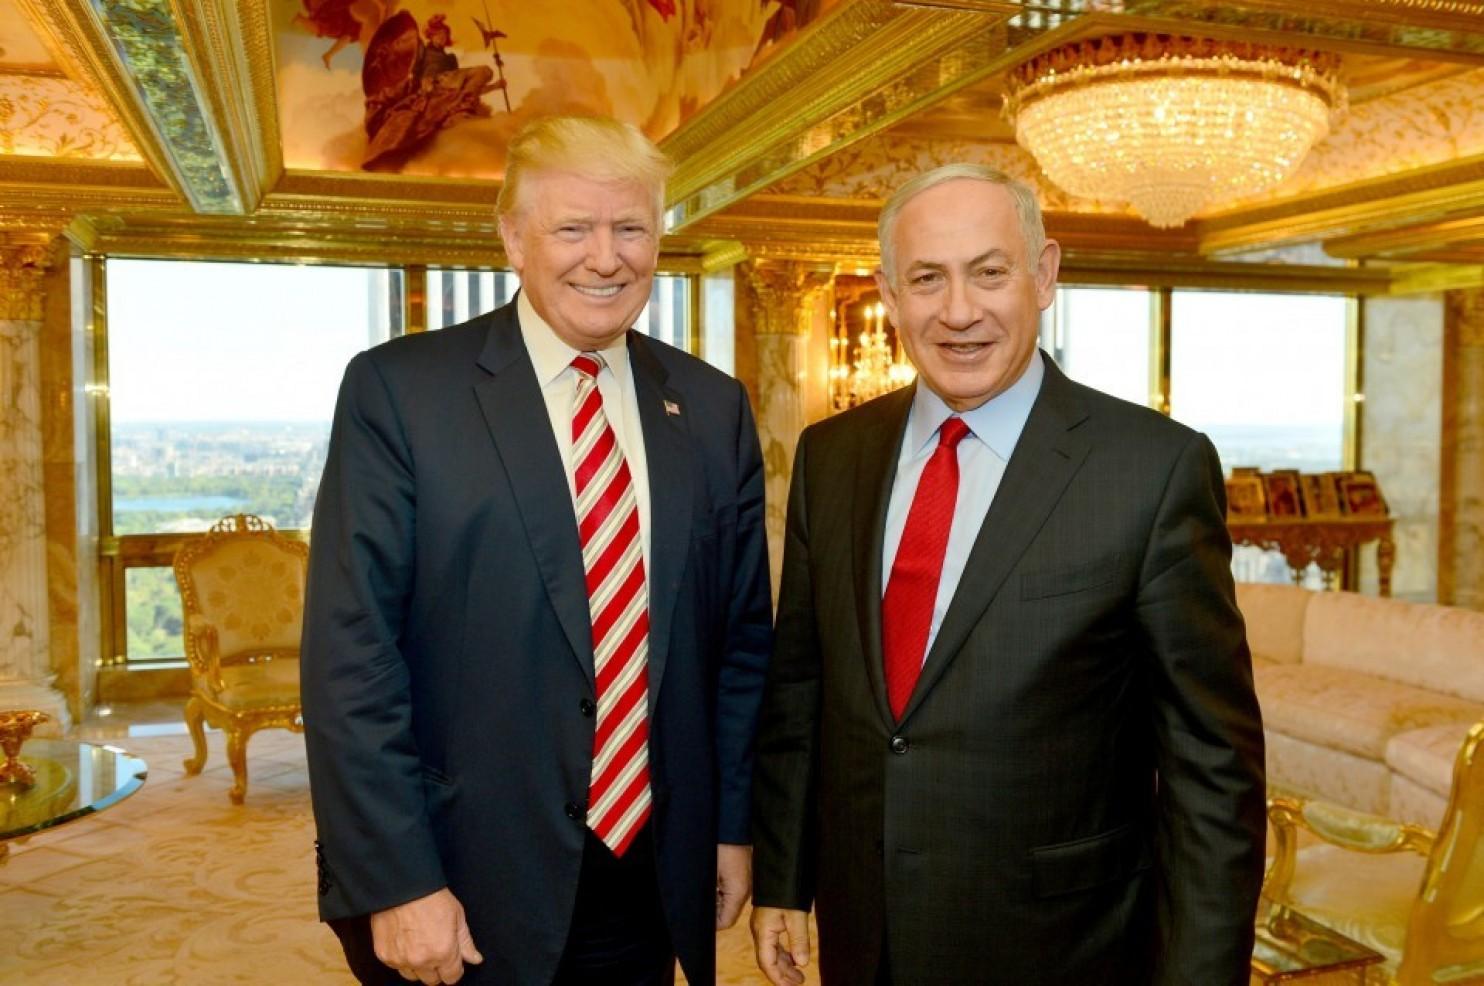 Then-candidate Trump met with Israeli Prime Minister Benjamin Netanyahu in September. (Handout via Reuters)